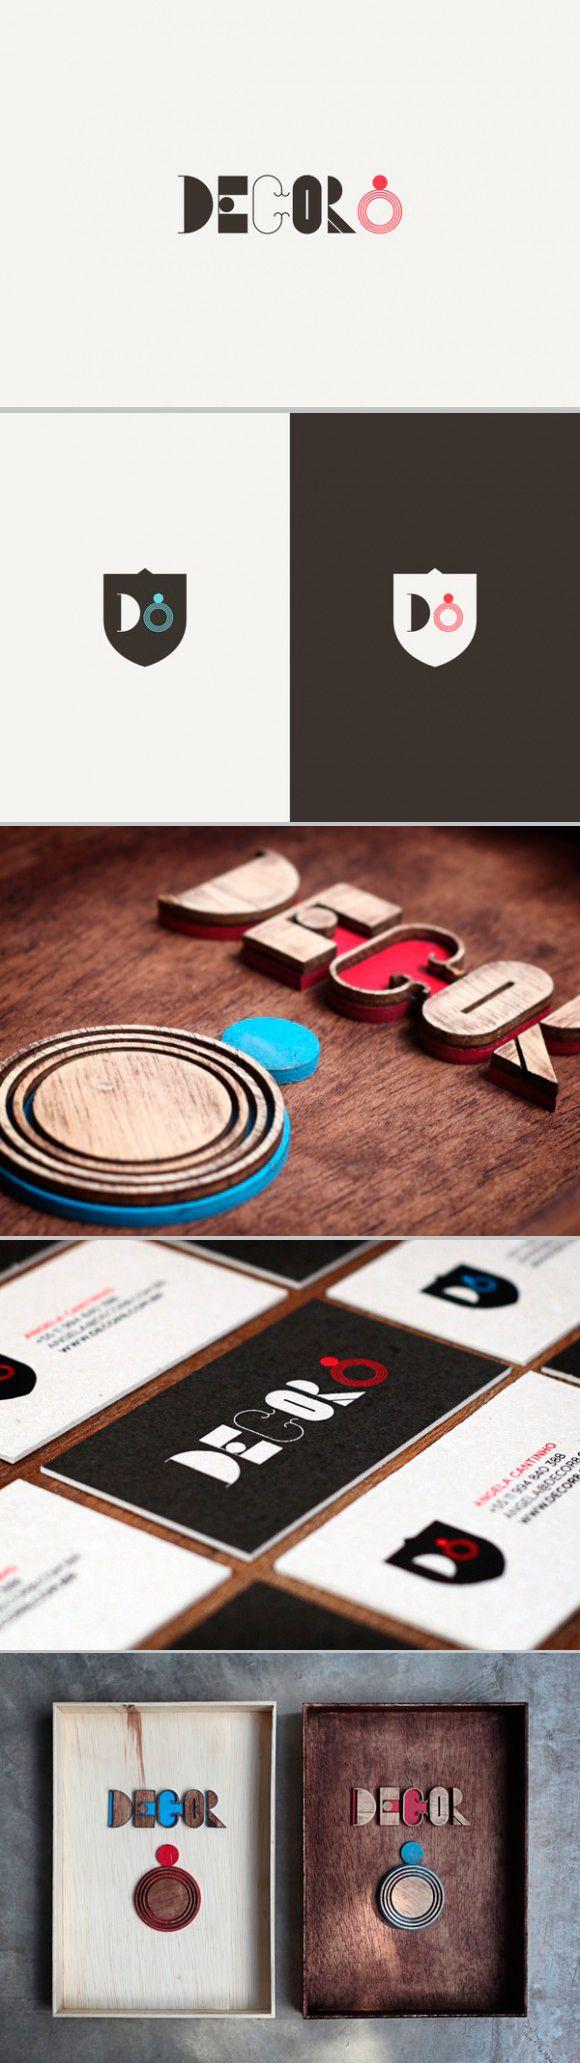 visual identity / decor8